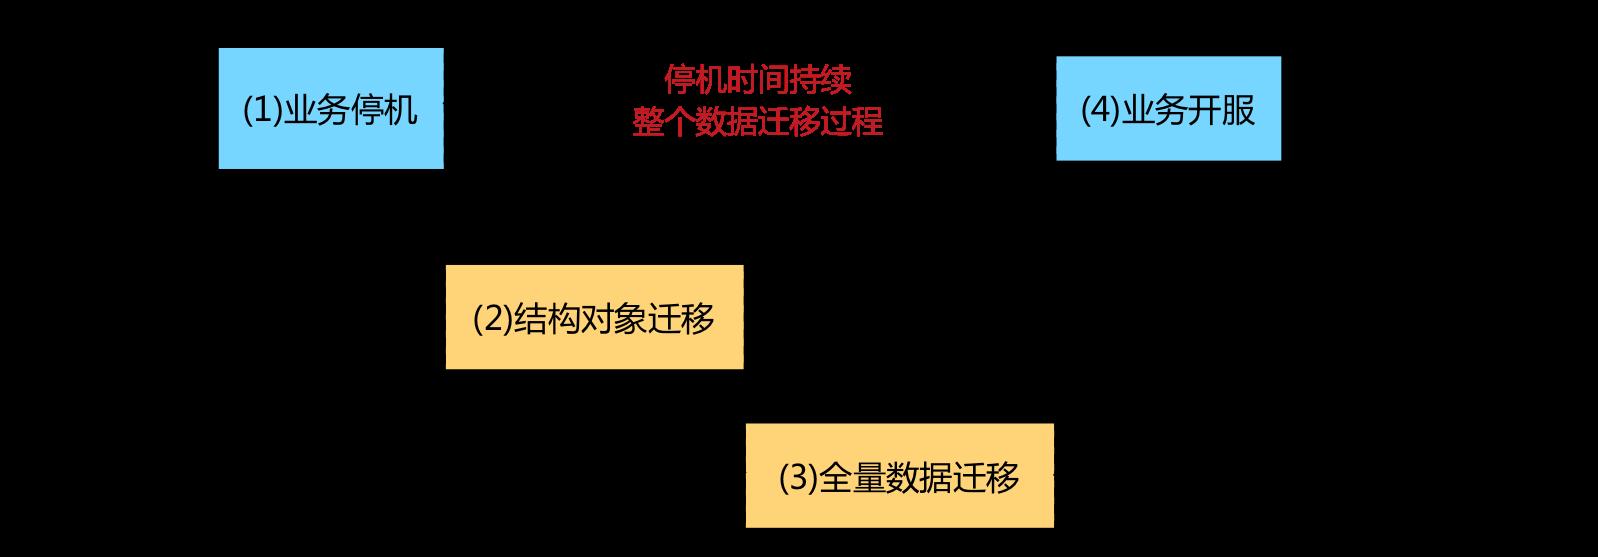 %E6%9C%8D%E5%8A%A1PostgreSQL%E8%BF%81%E7%A7%BB%E8%87%B3MySQL%E5%85%A8%E8%AE%B0%E5%BD%95%20c1aa24eb091540f4a34e9a51b946a35e/Untitled%203.png